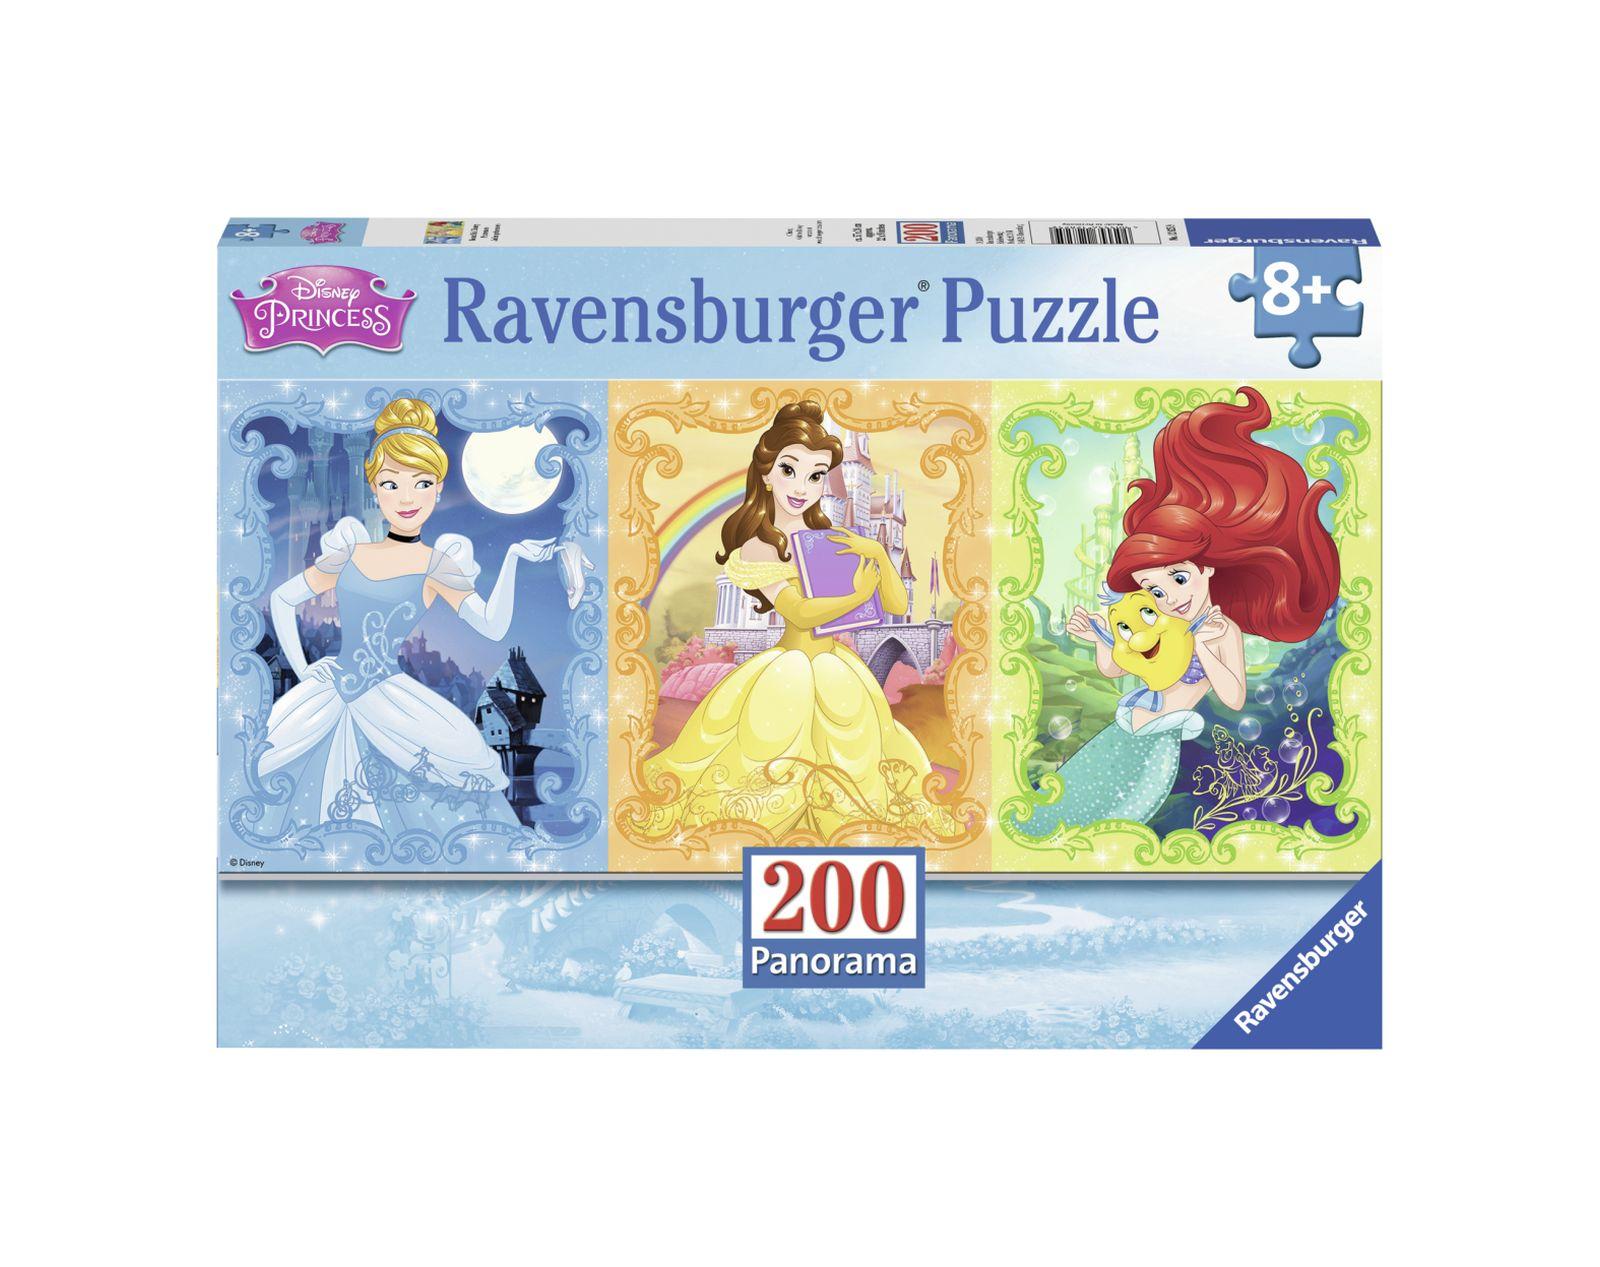 Ravensburger - puzzle 200 pezzi xxl - principesse disney panorama - Ravensburger1